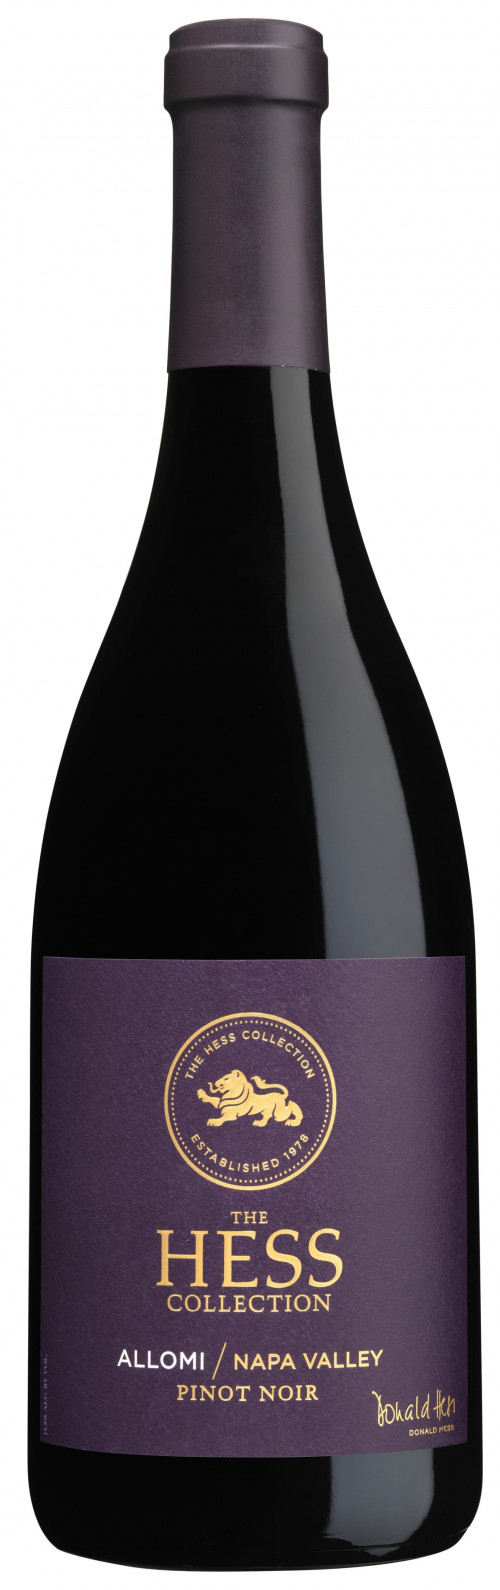 2019 Hess Allomi Napa Valley Pinot Noir 750ml